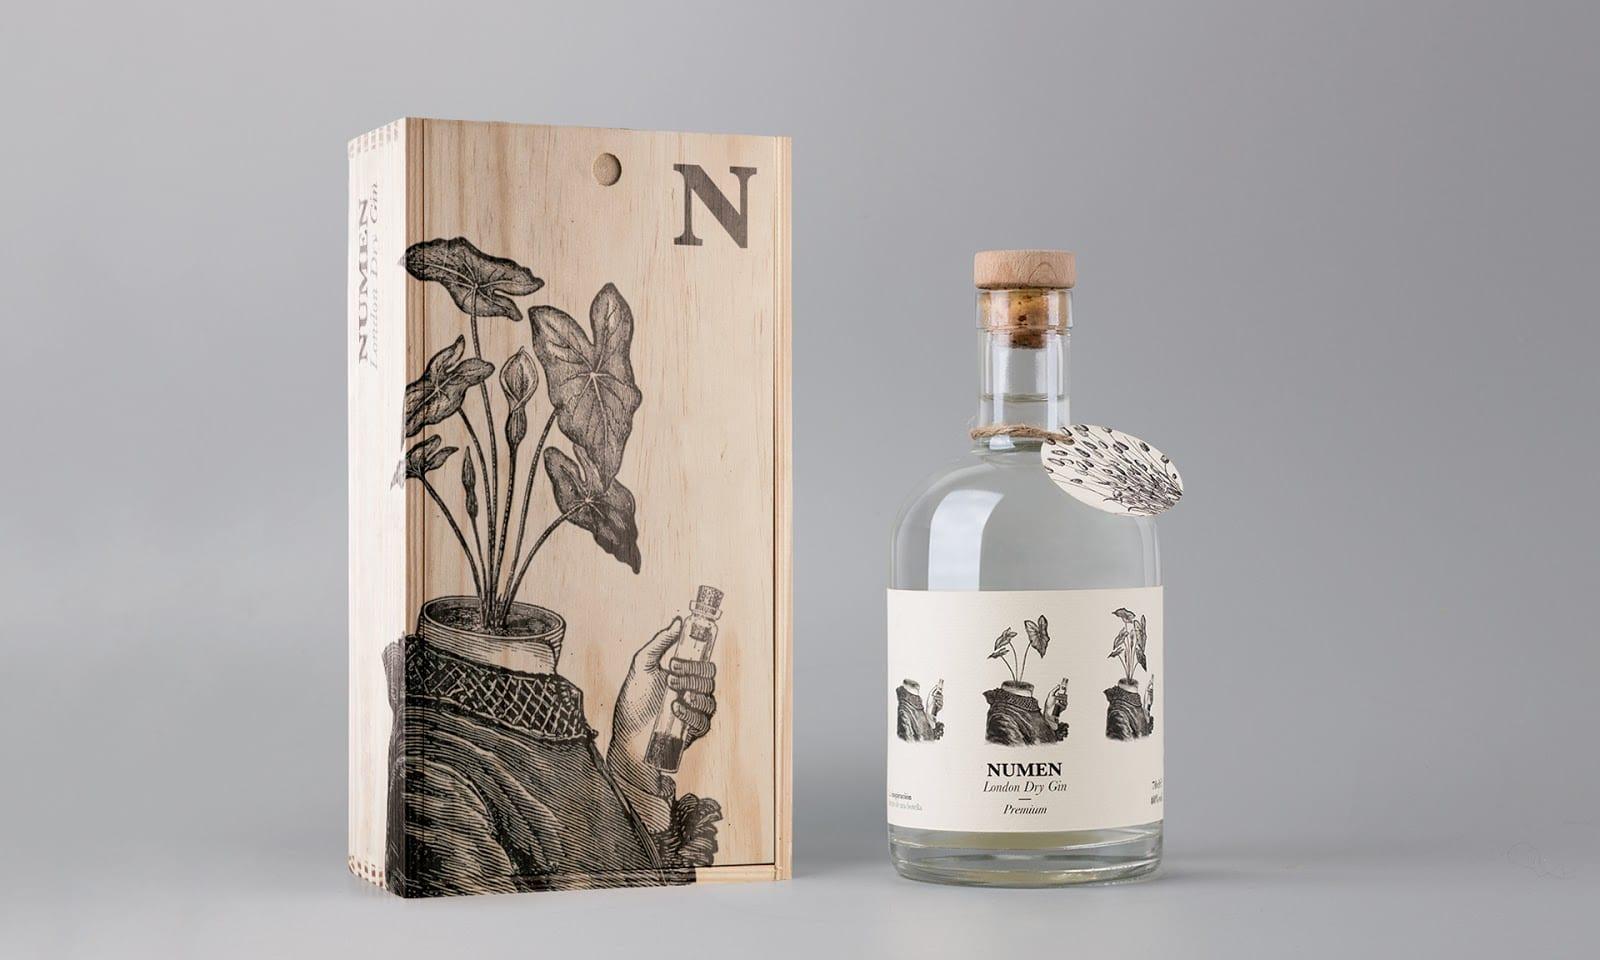 Numen Dry Gin 015 - Ach, tie obaly – Numen Dry Gin